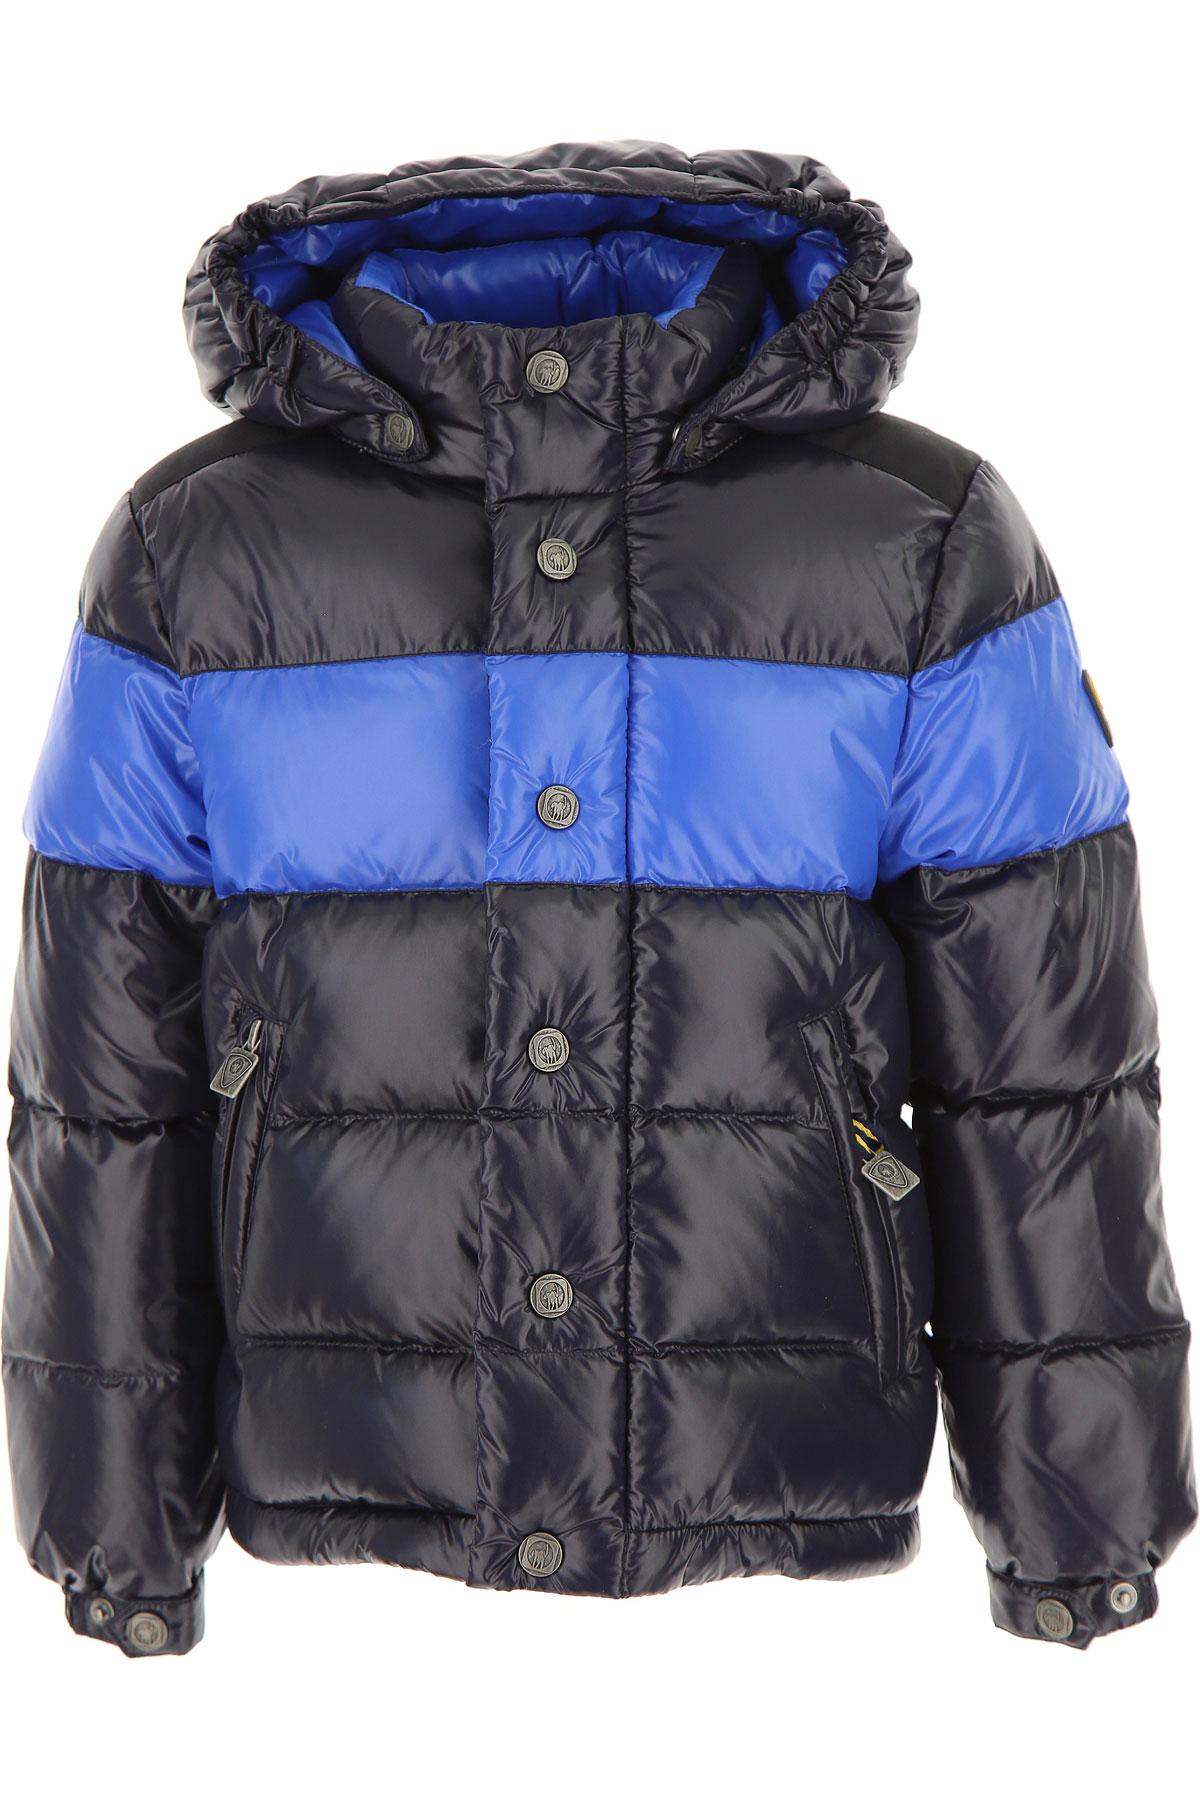 Ciesse Piumini Boys Down Jacket for Kids, Puffer Ski Jacket On Sale, navy, polyamide, 2019, 4Y 8Y